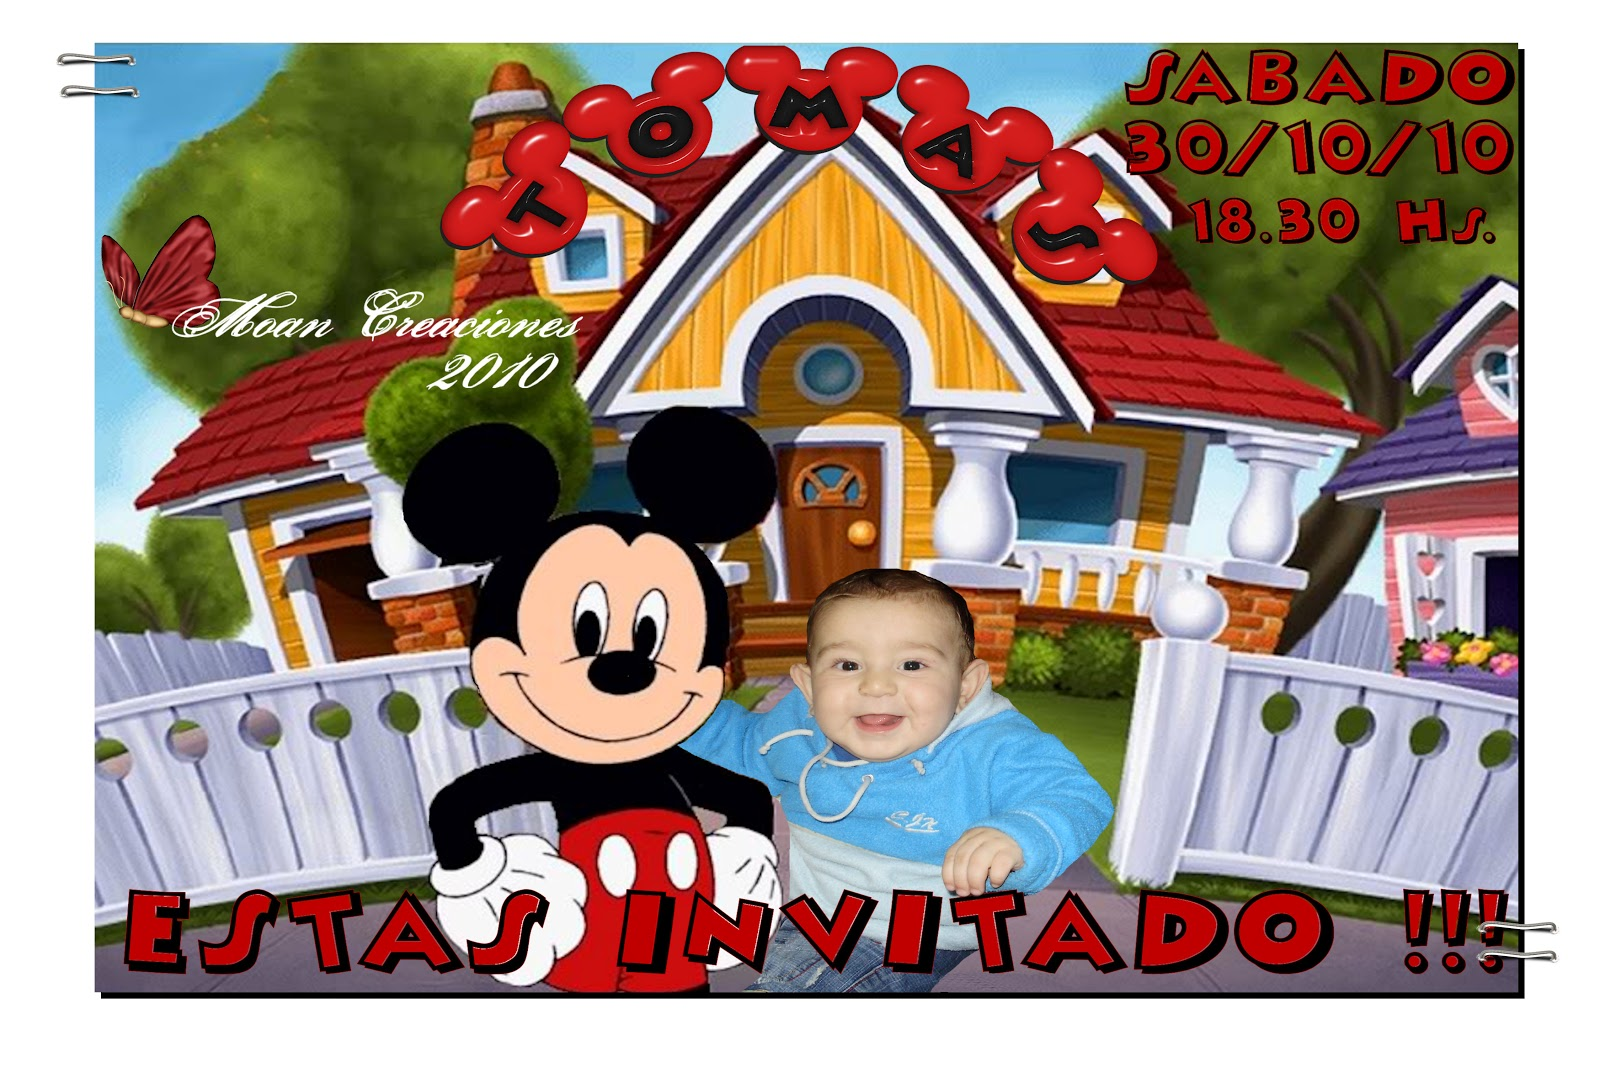 Invitaciones Para Cumpleaños Fotomontajes Gratis Imagui